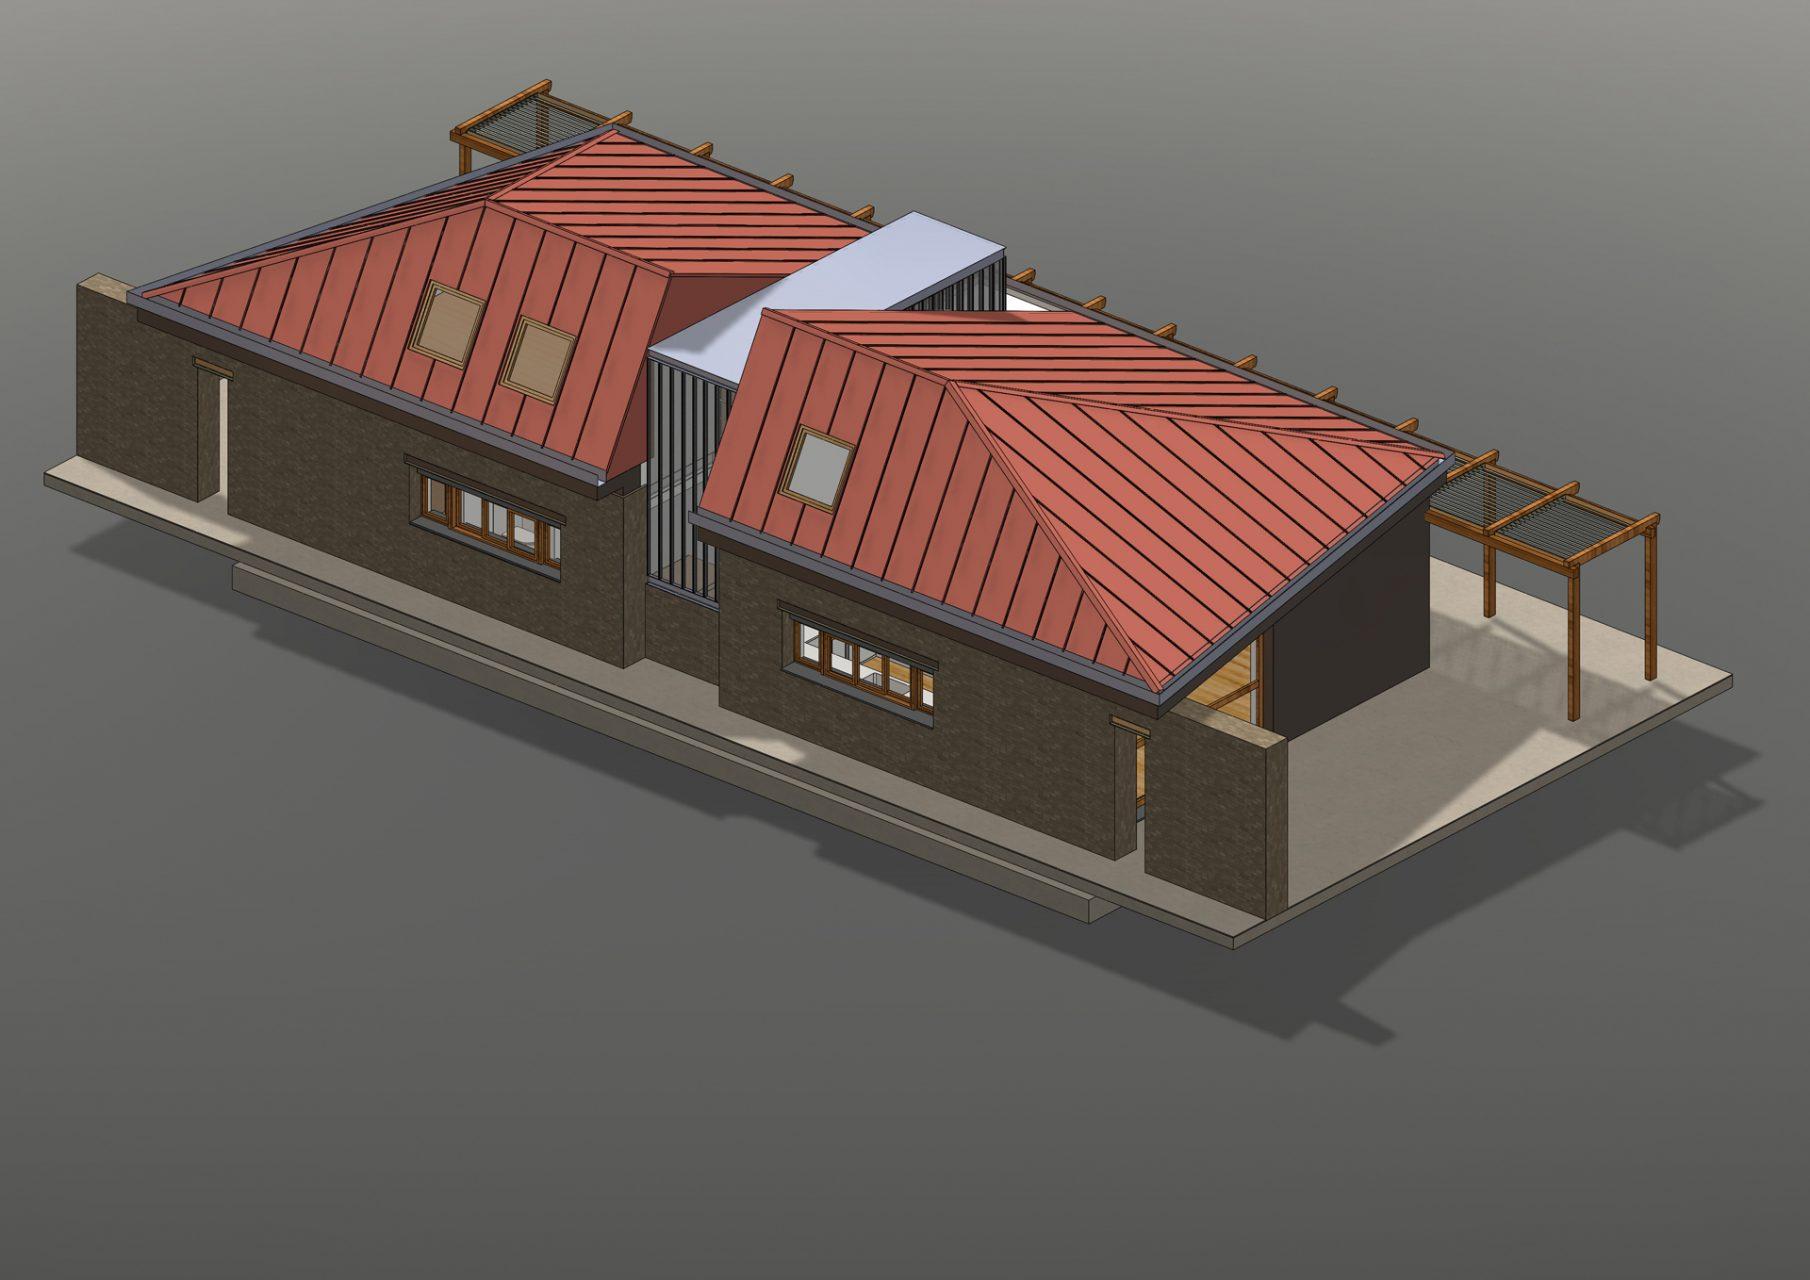 KL HOUSE 07 - axonometric view exterior F